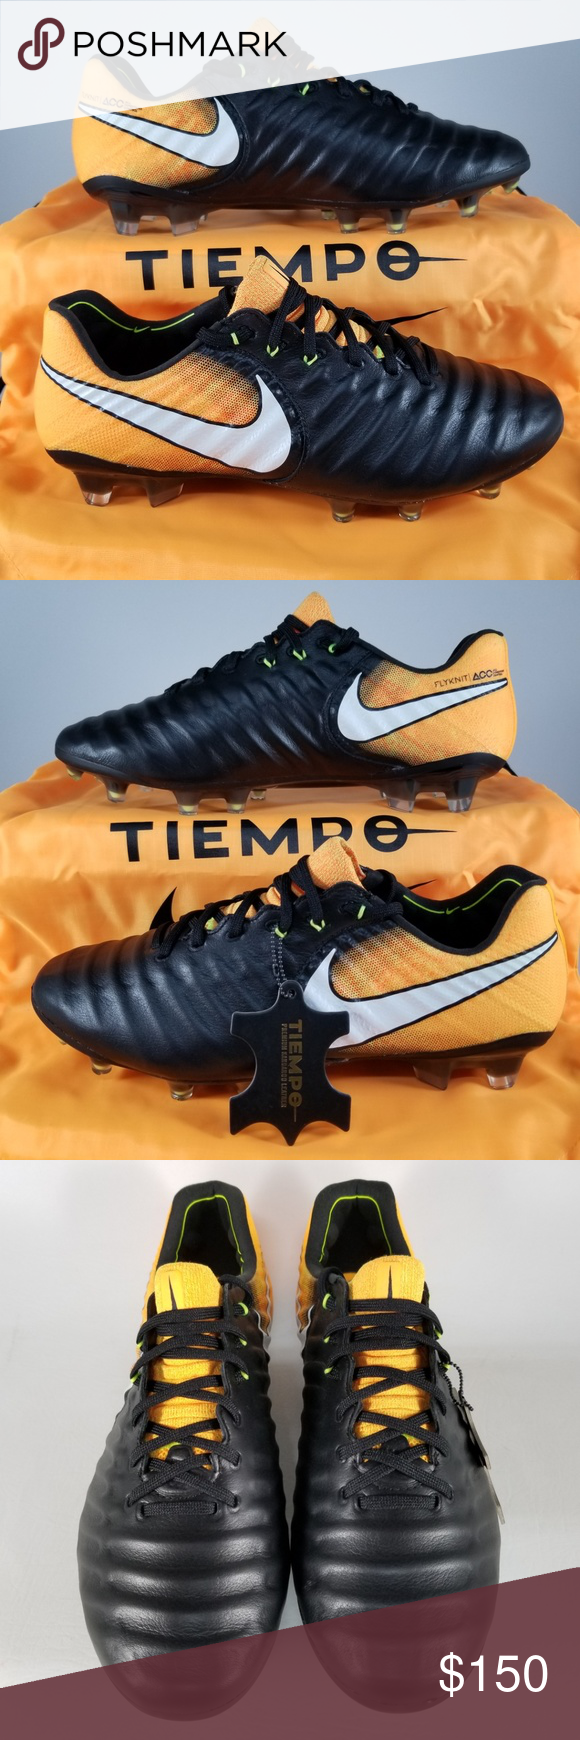 8f2adb86e5d Nike Tiempo Legend VII FG Soccer Cleat SZ 7 Orange Nike Tiempo Legend VII FG  Soccer